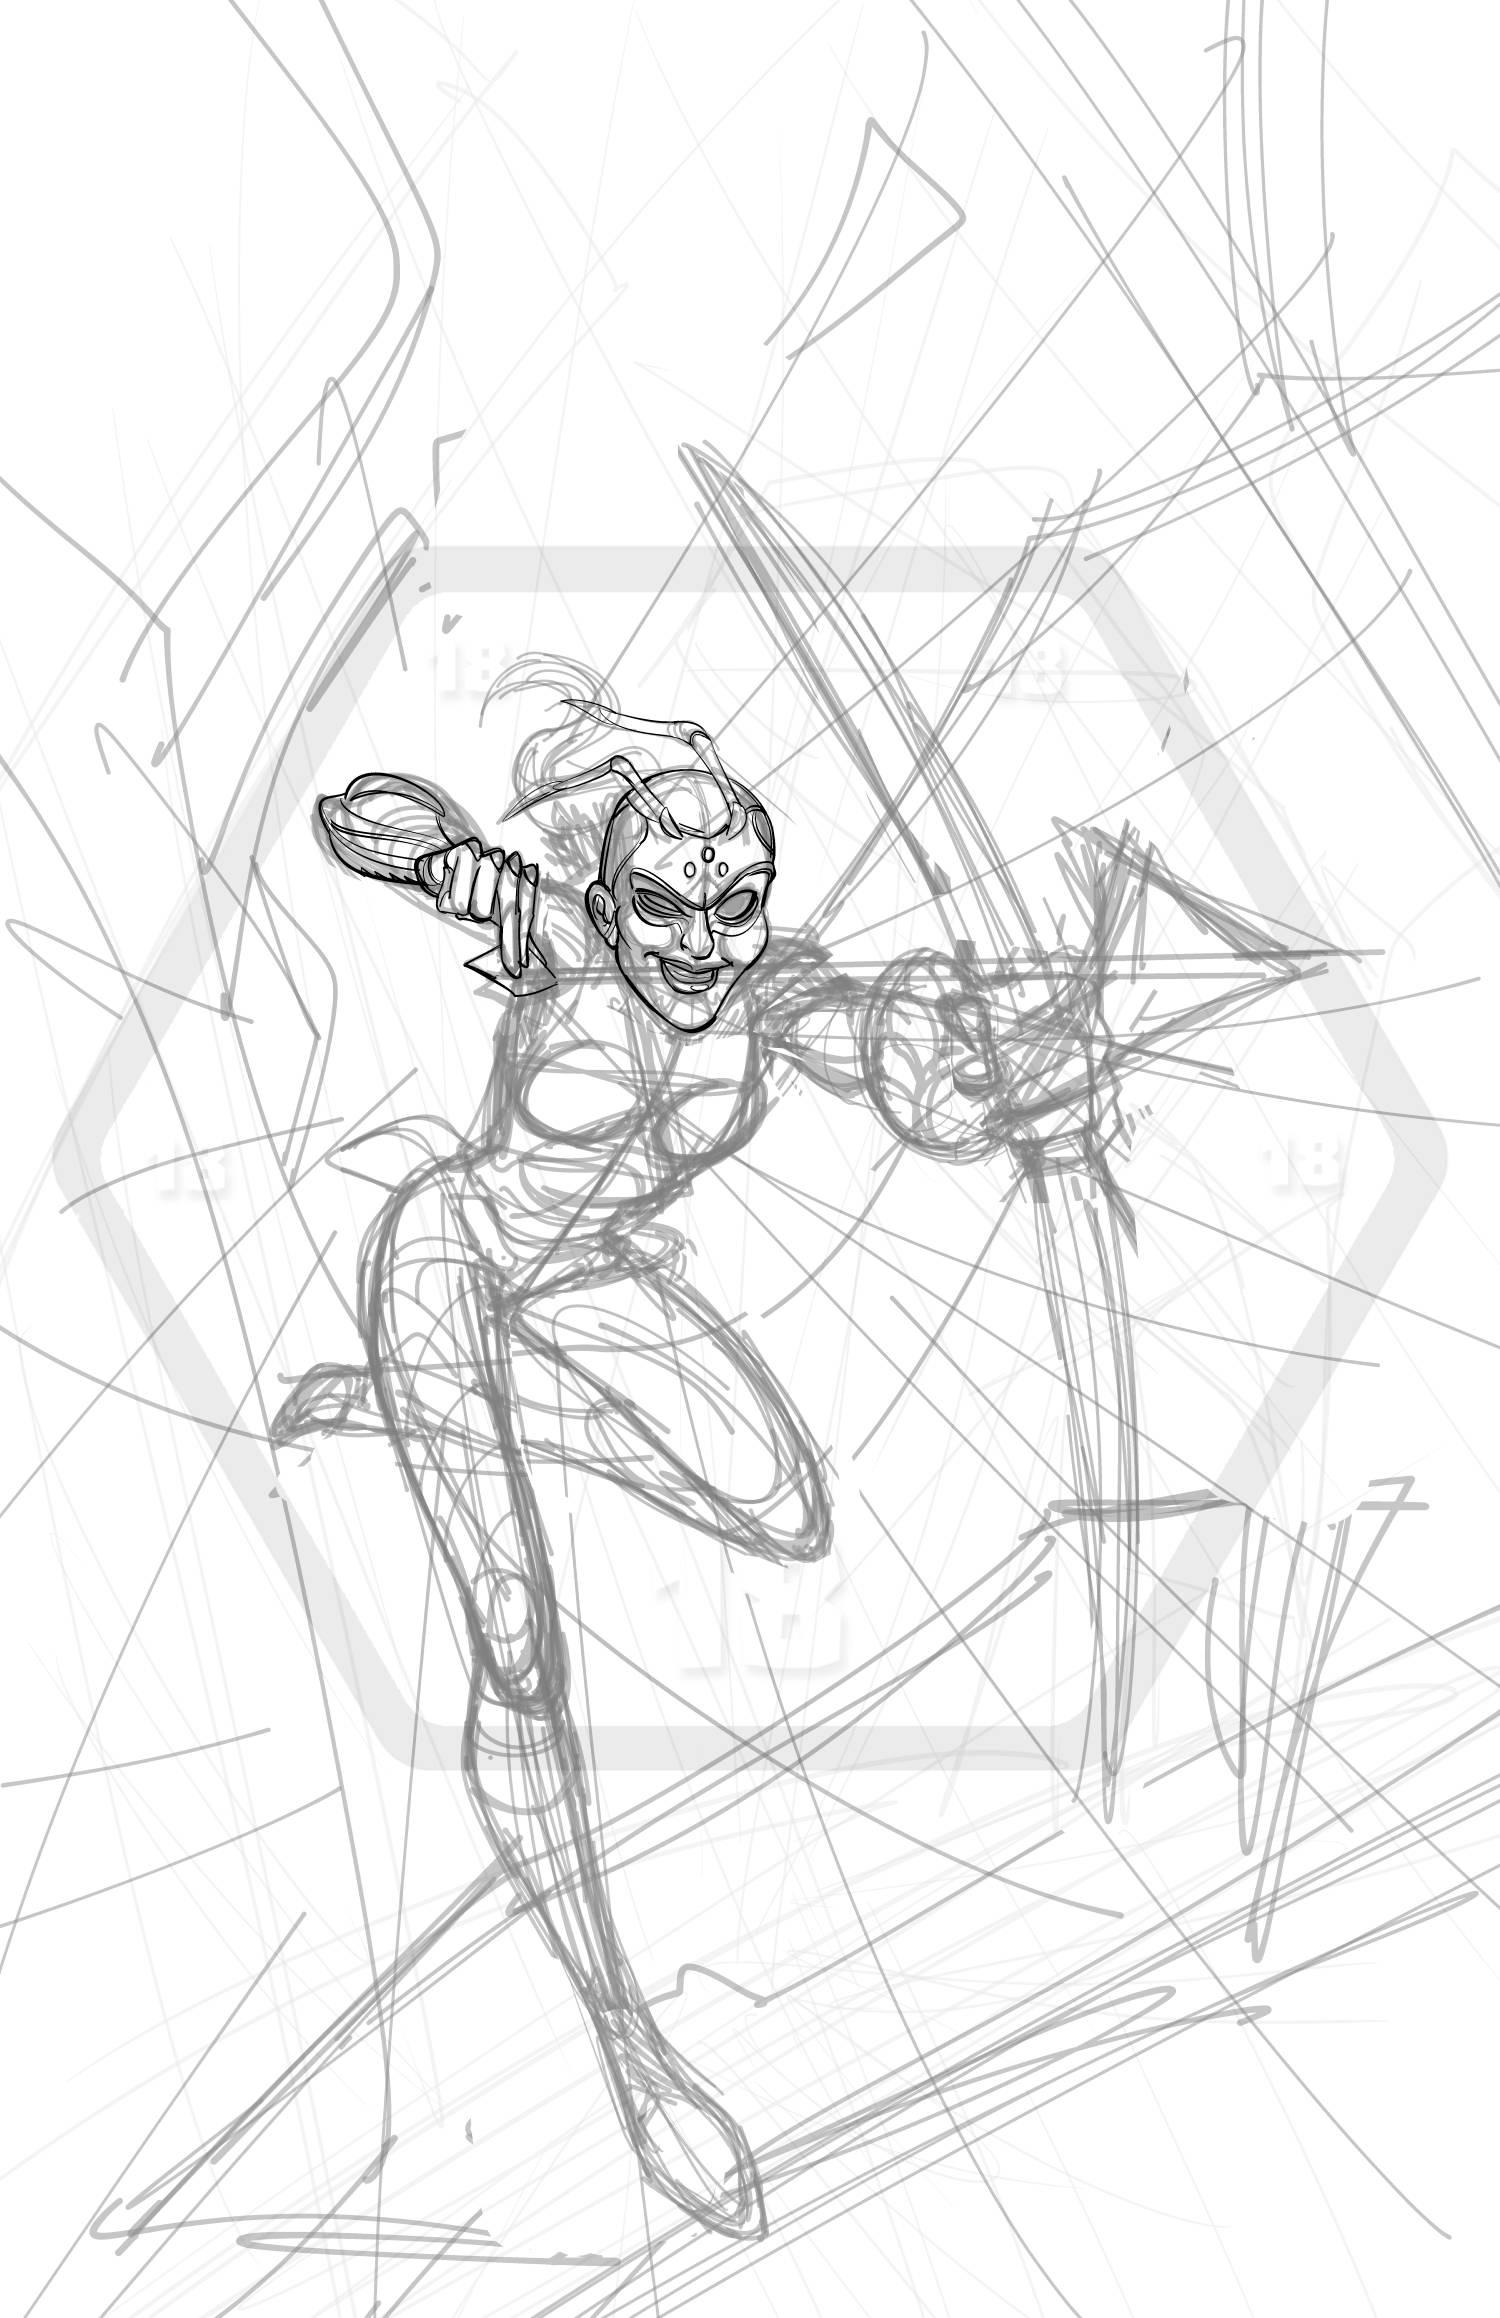 HIVESMASHERS-cg-archer-pencils-001.jpg